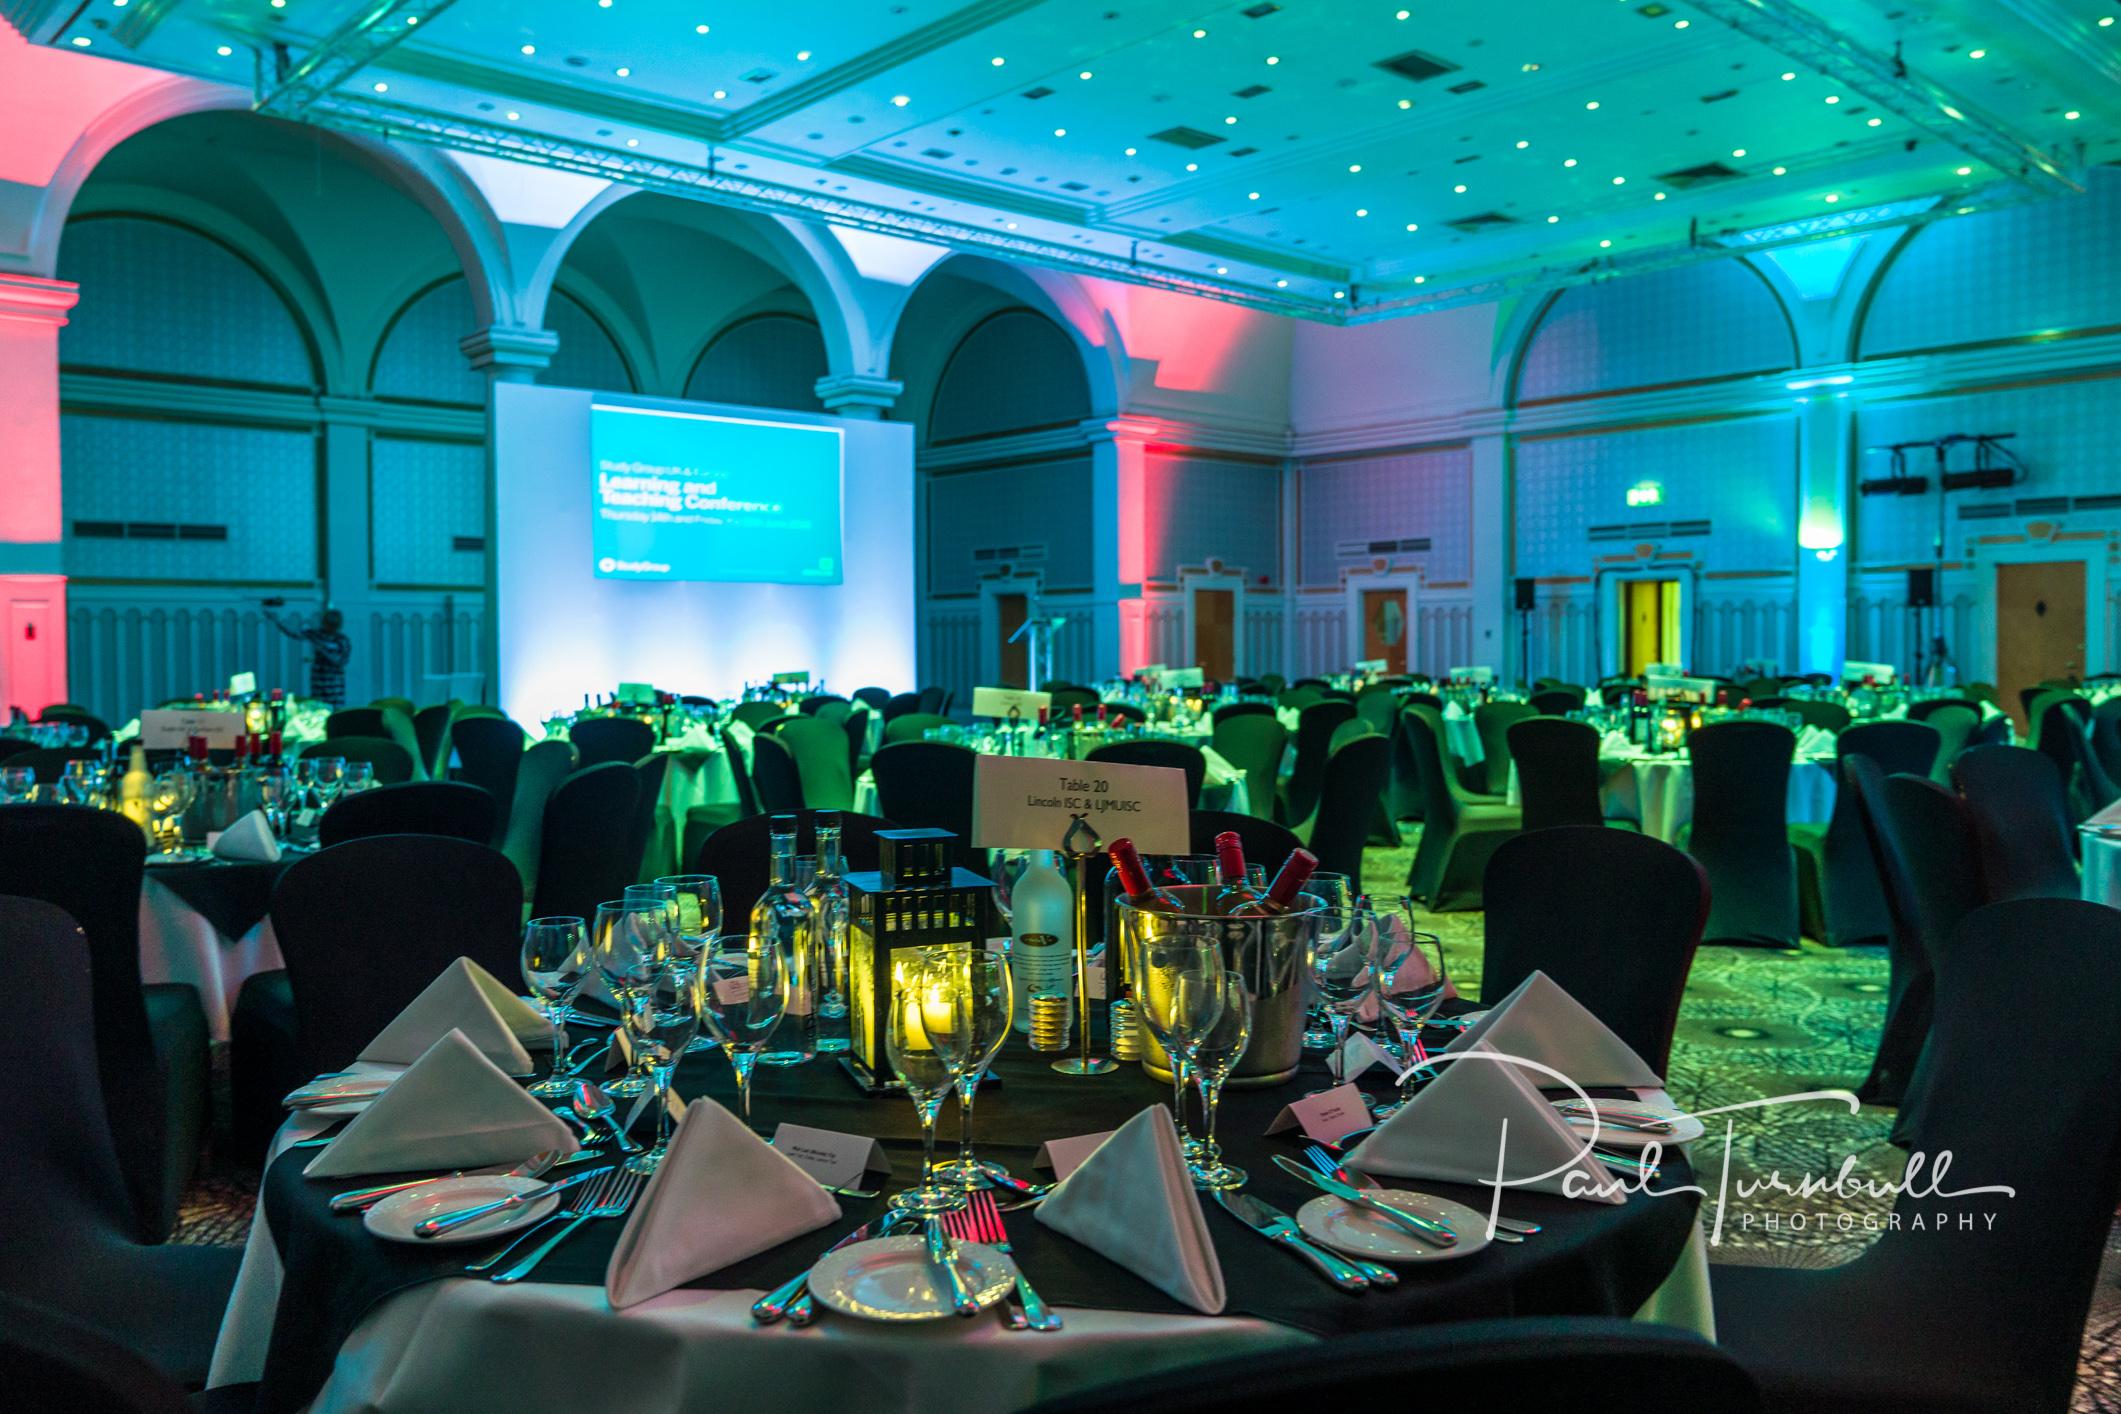 conference-event-photographer-queens-hotel-leeds-yorkshire-001.jpg